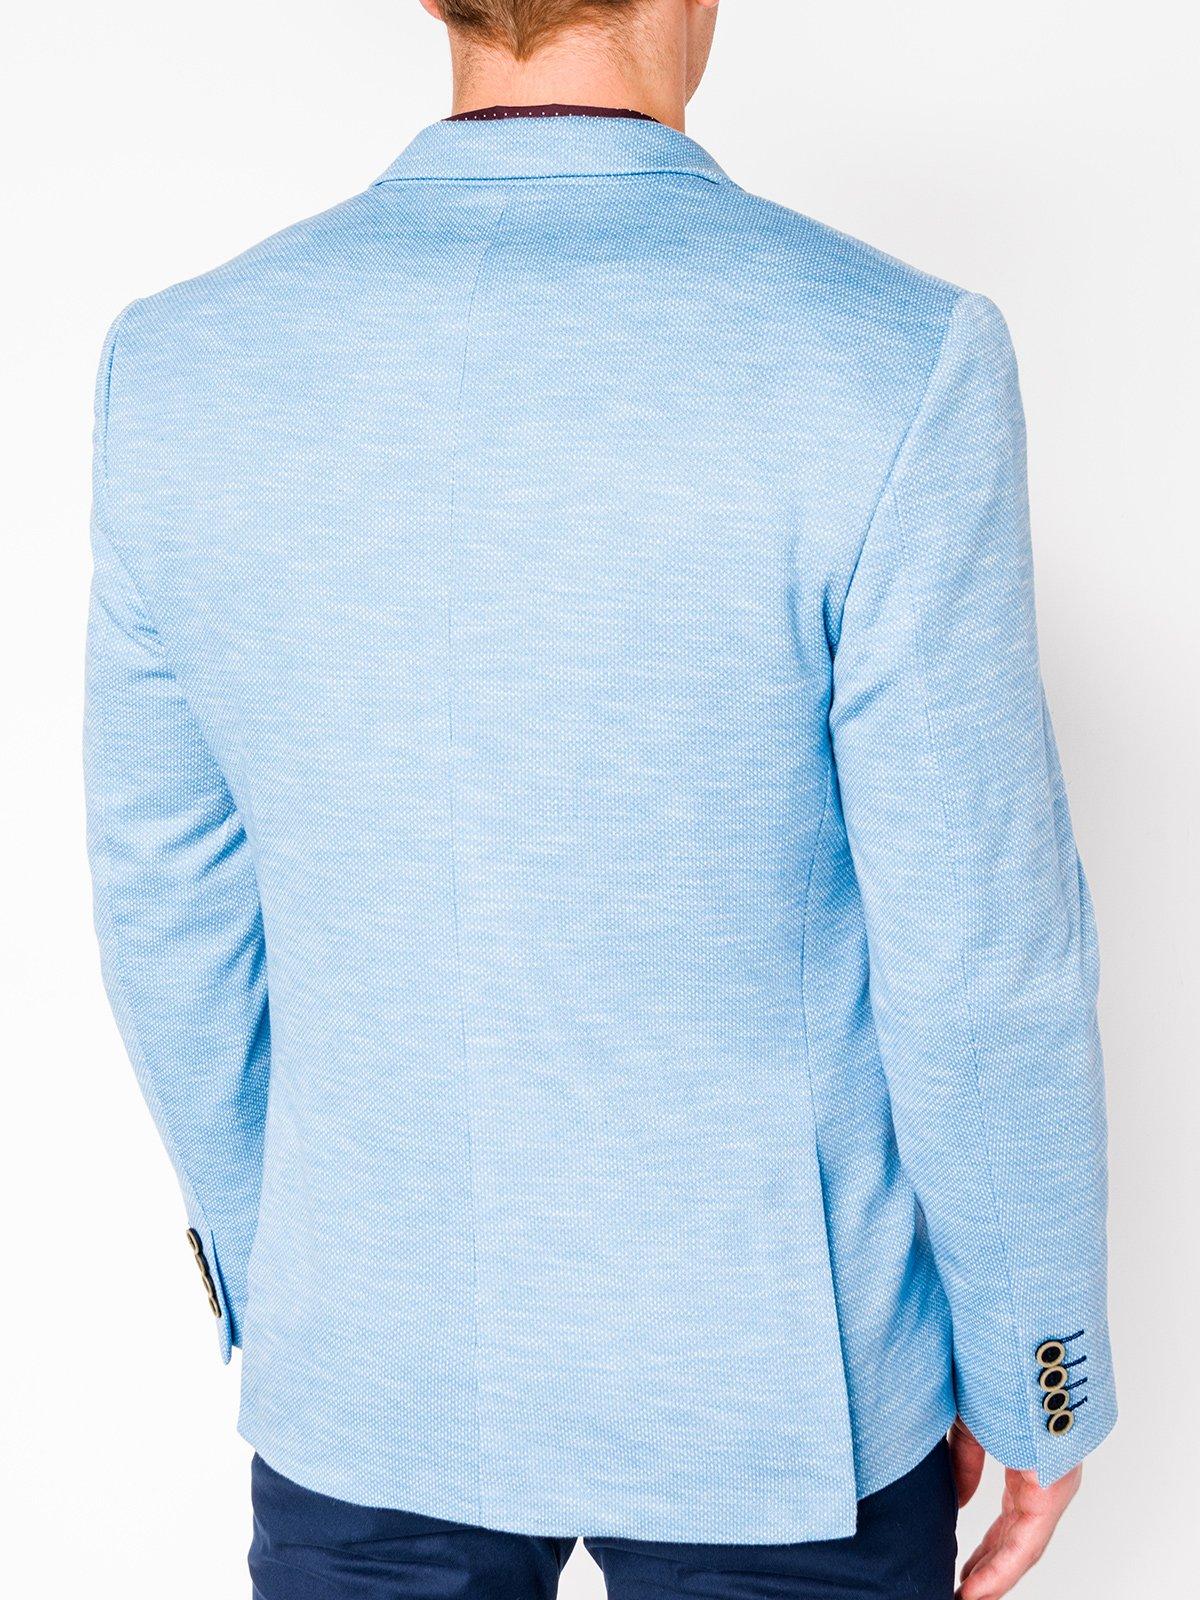 d64546495f622 Marynarka męska casual M88 - błękitna. Cena katalogowa: